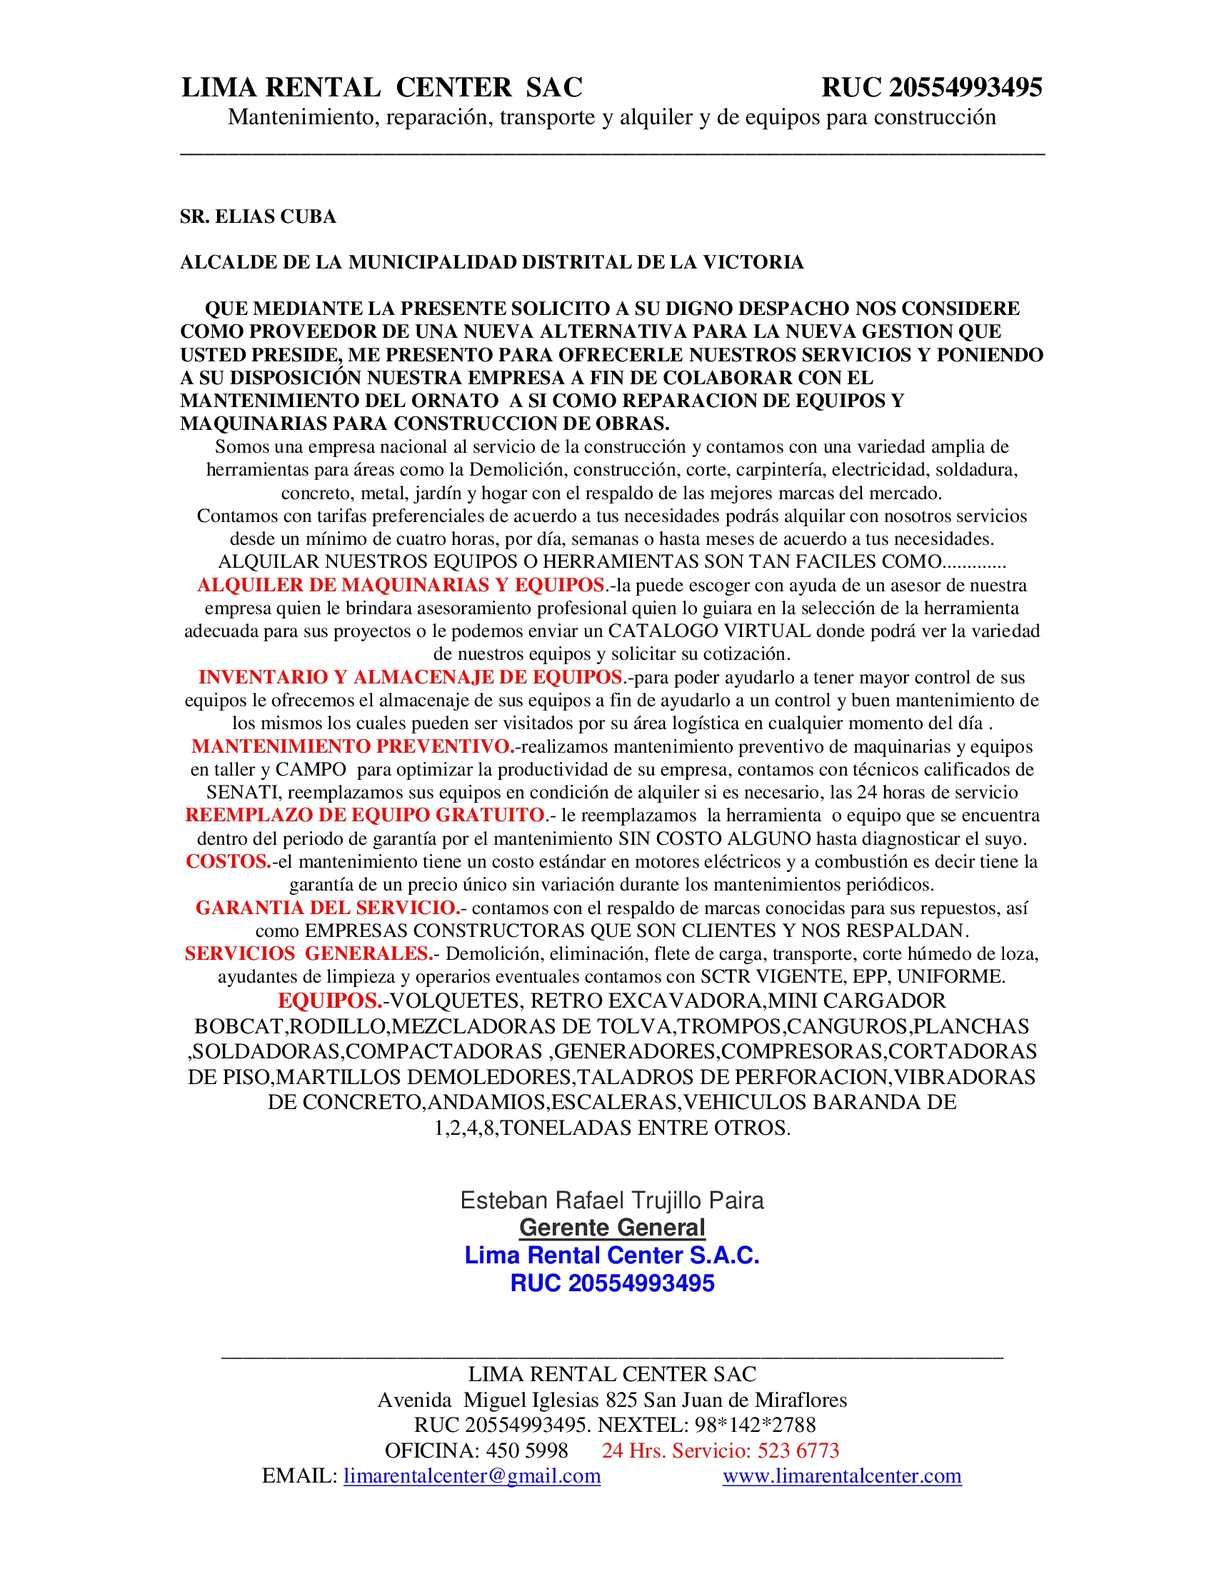 Fantástico Gerente De Mantenimiento Carta De Presentación Modelo ...